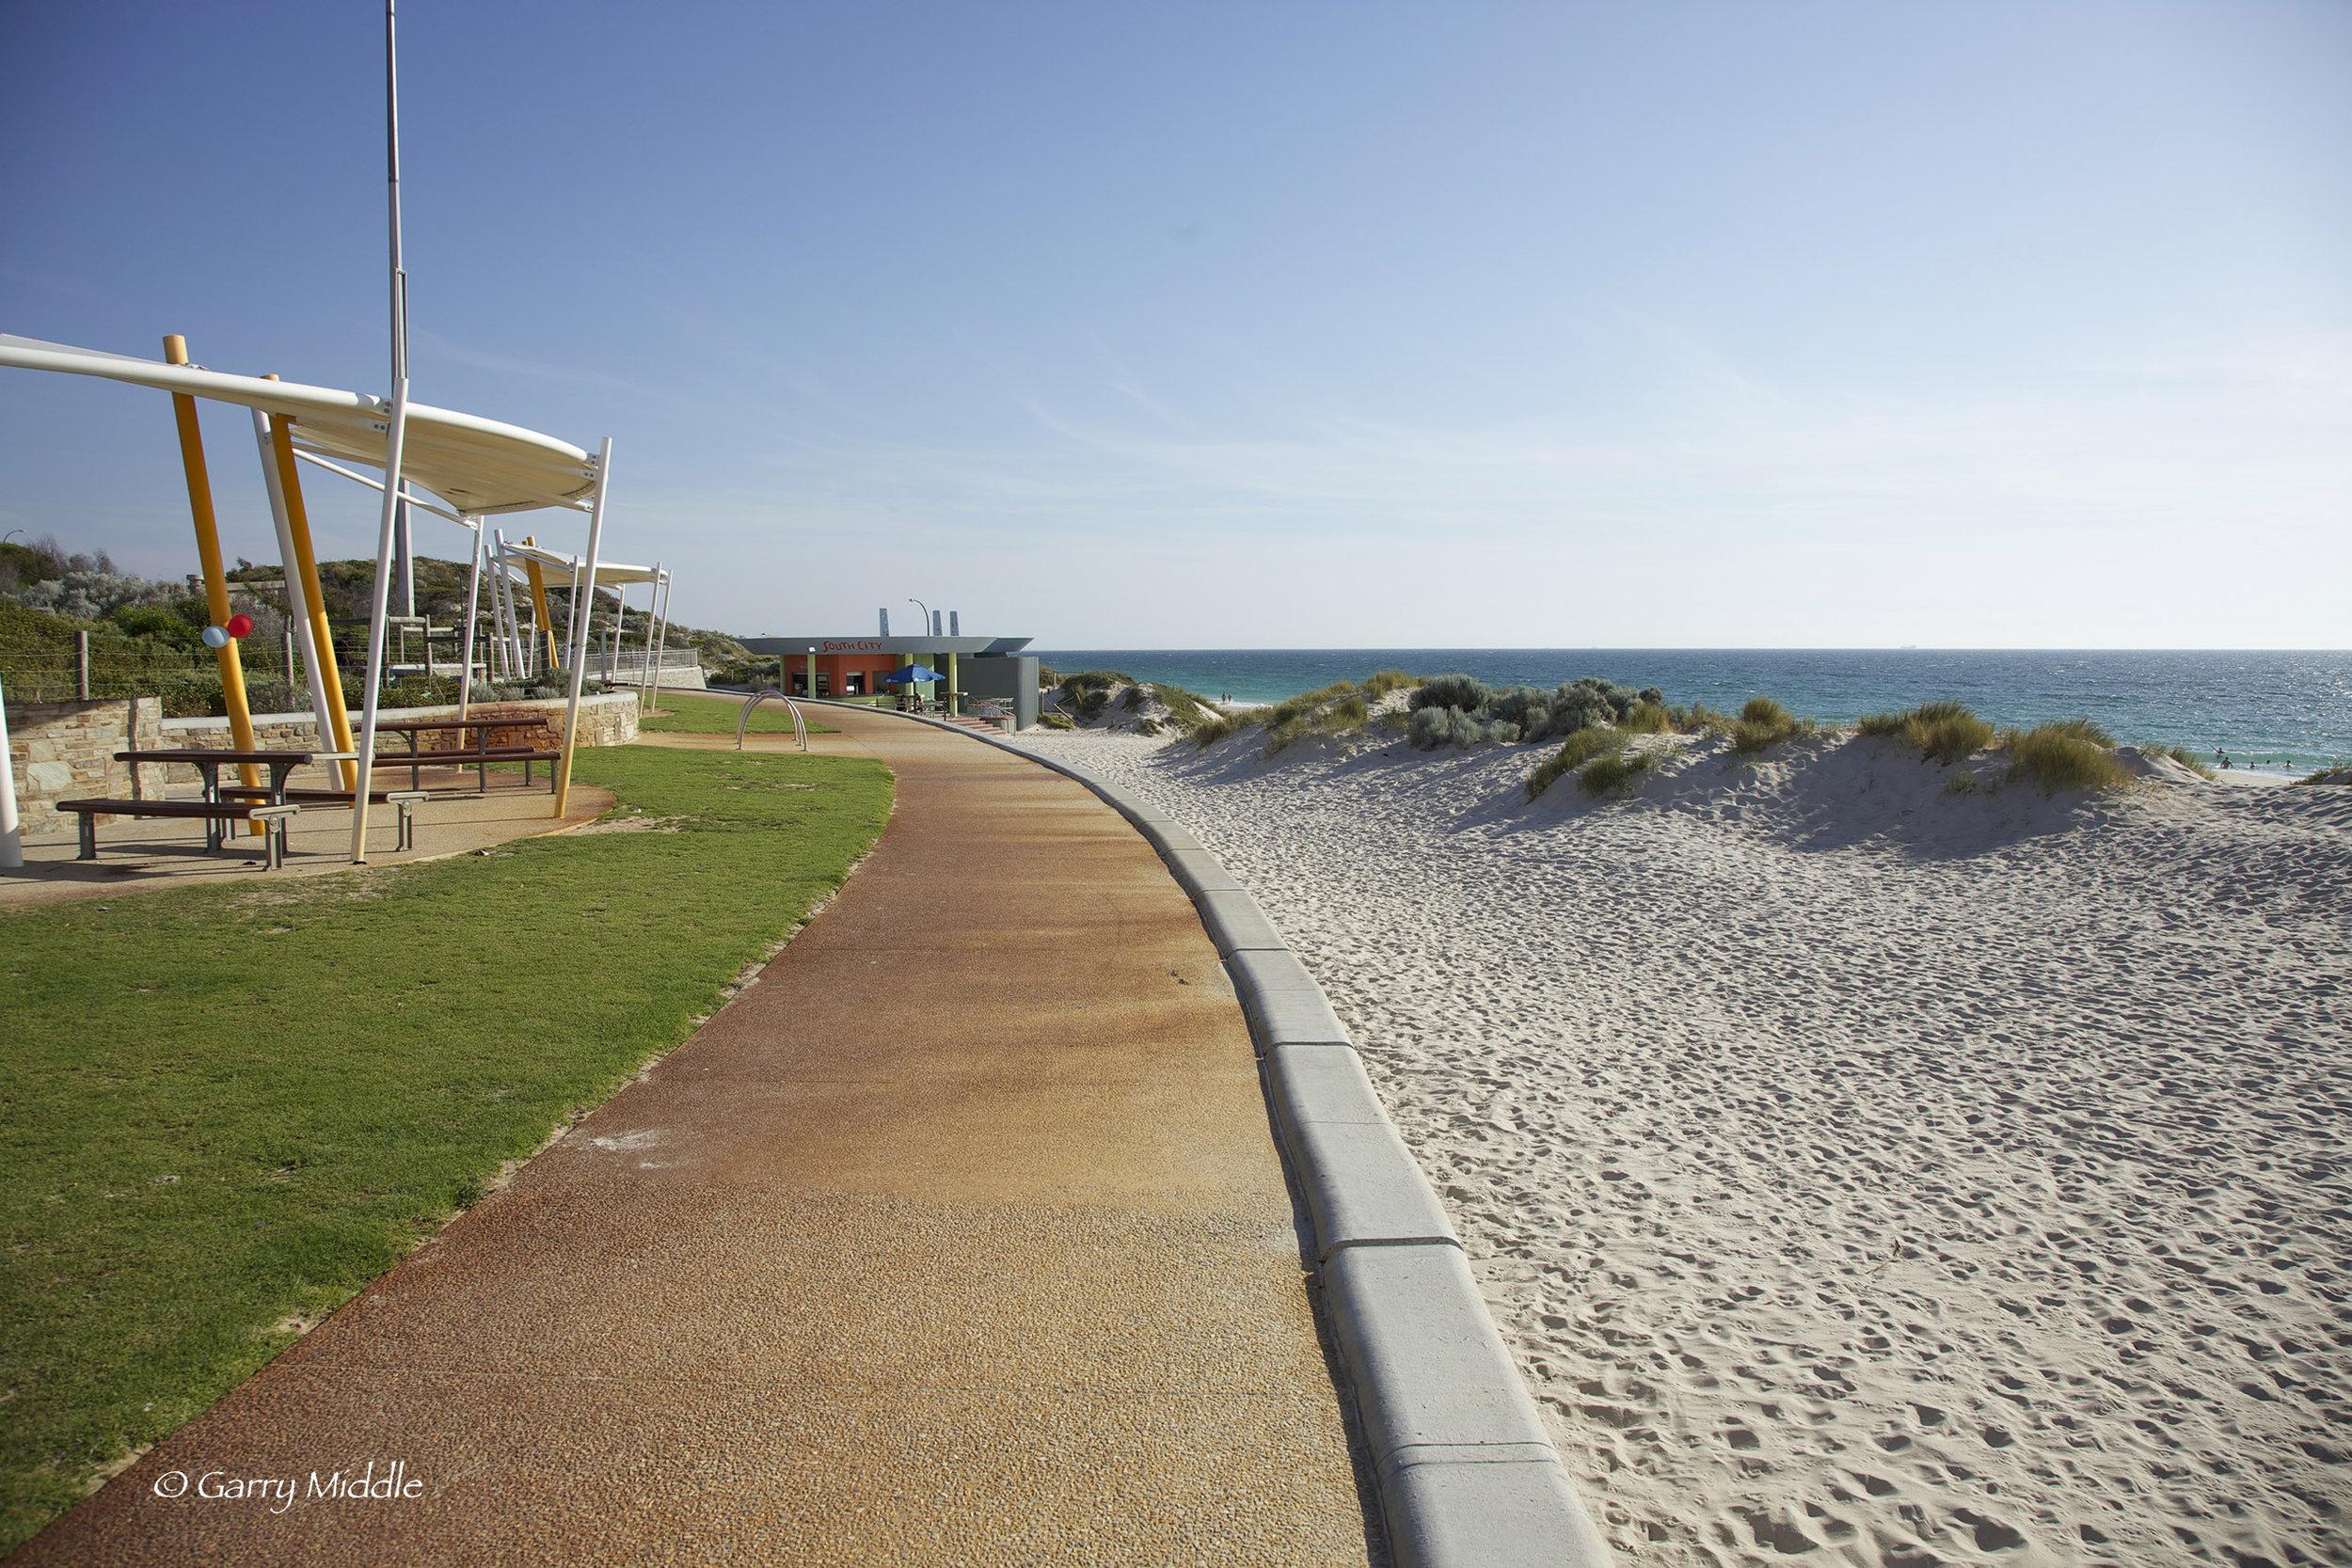 Plate 2: Concrete path - City Beach